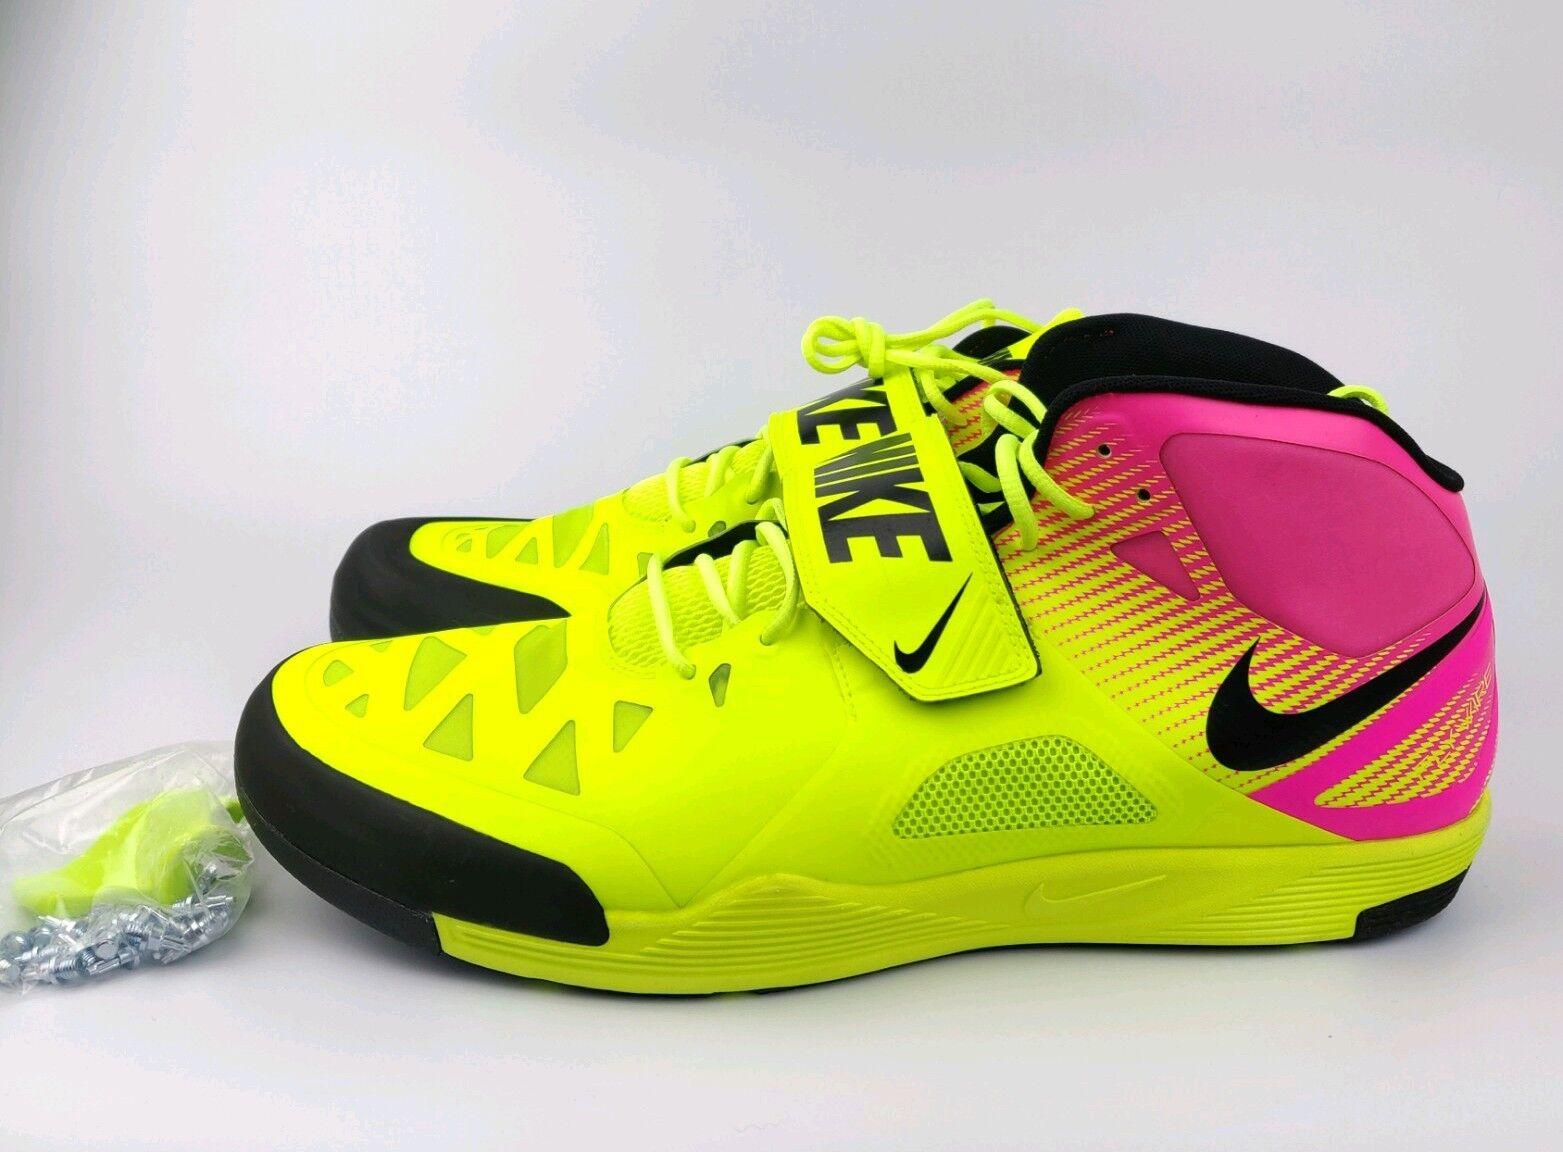 Nike Zoom Javelin Elite 2 Track Spikes shoes Volt Pink Rio mens sz 15 631055 999